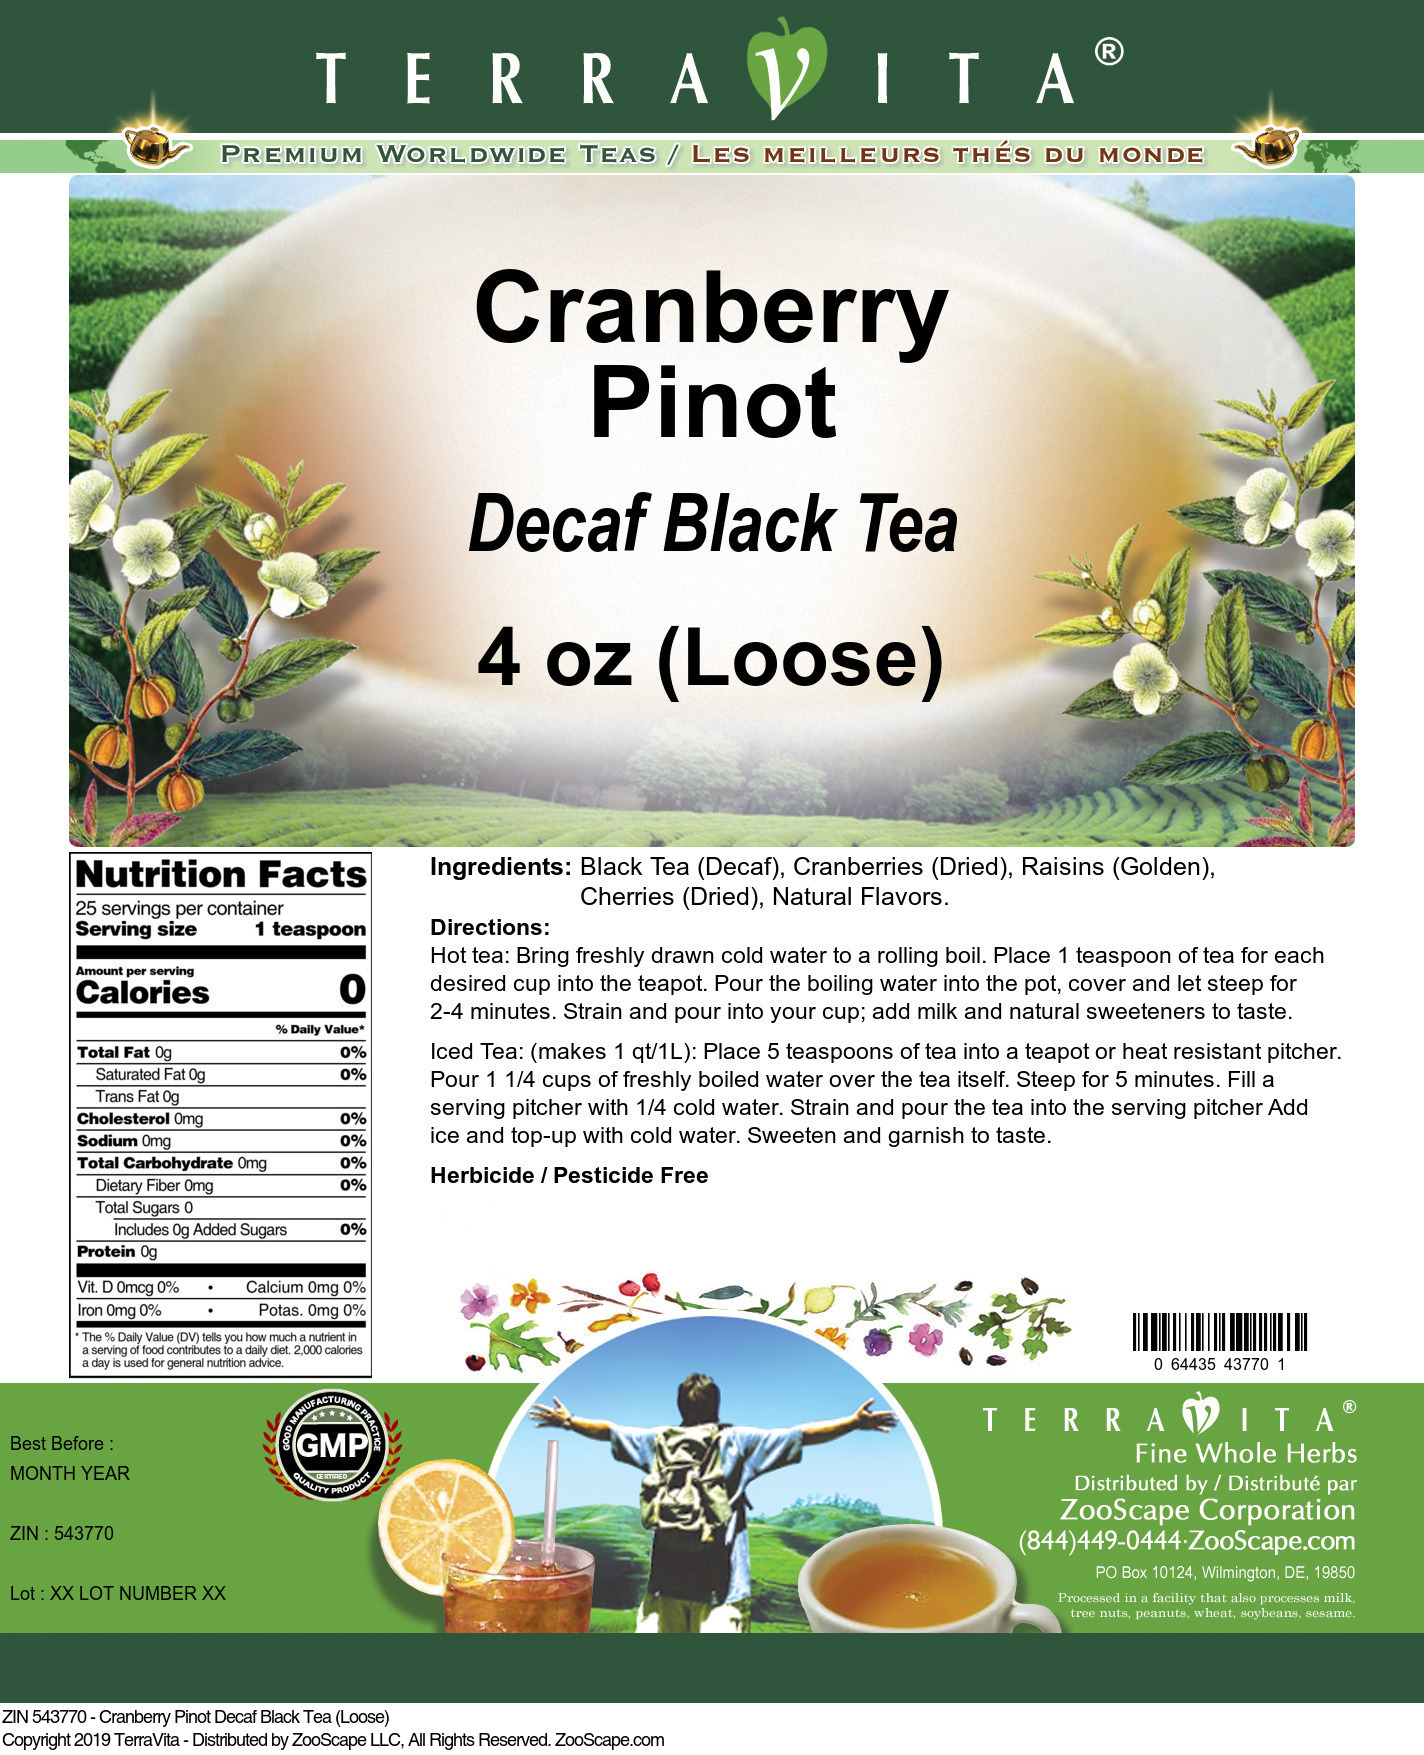 Cranberry Pinot Decaf Black Tea (Loose)